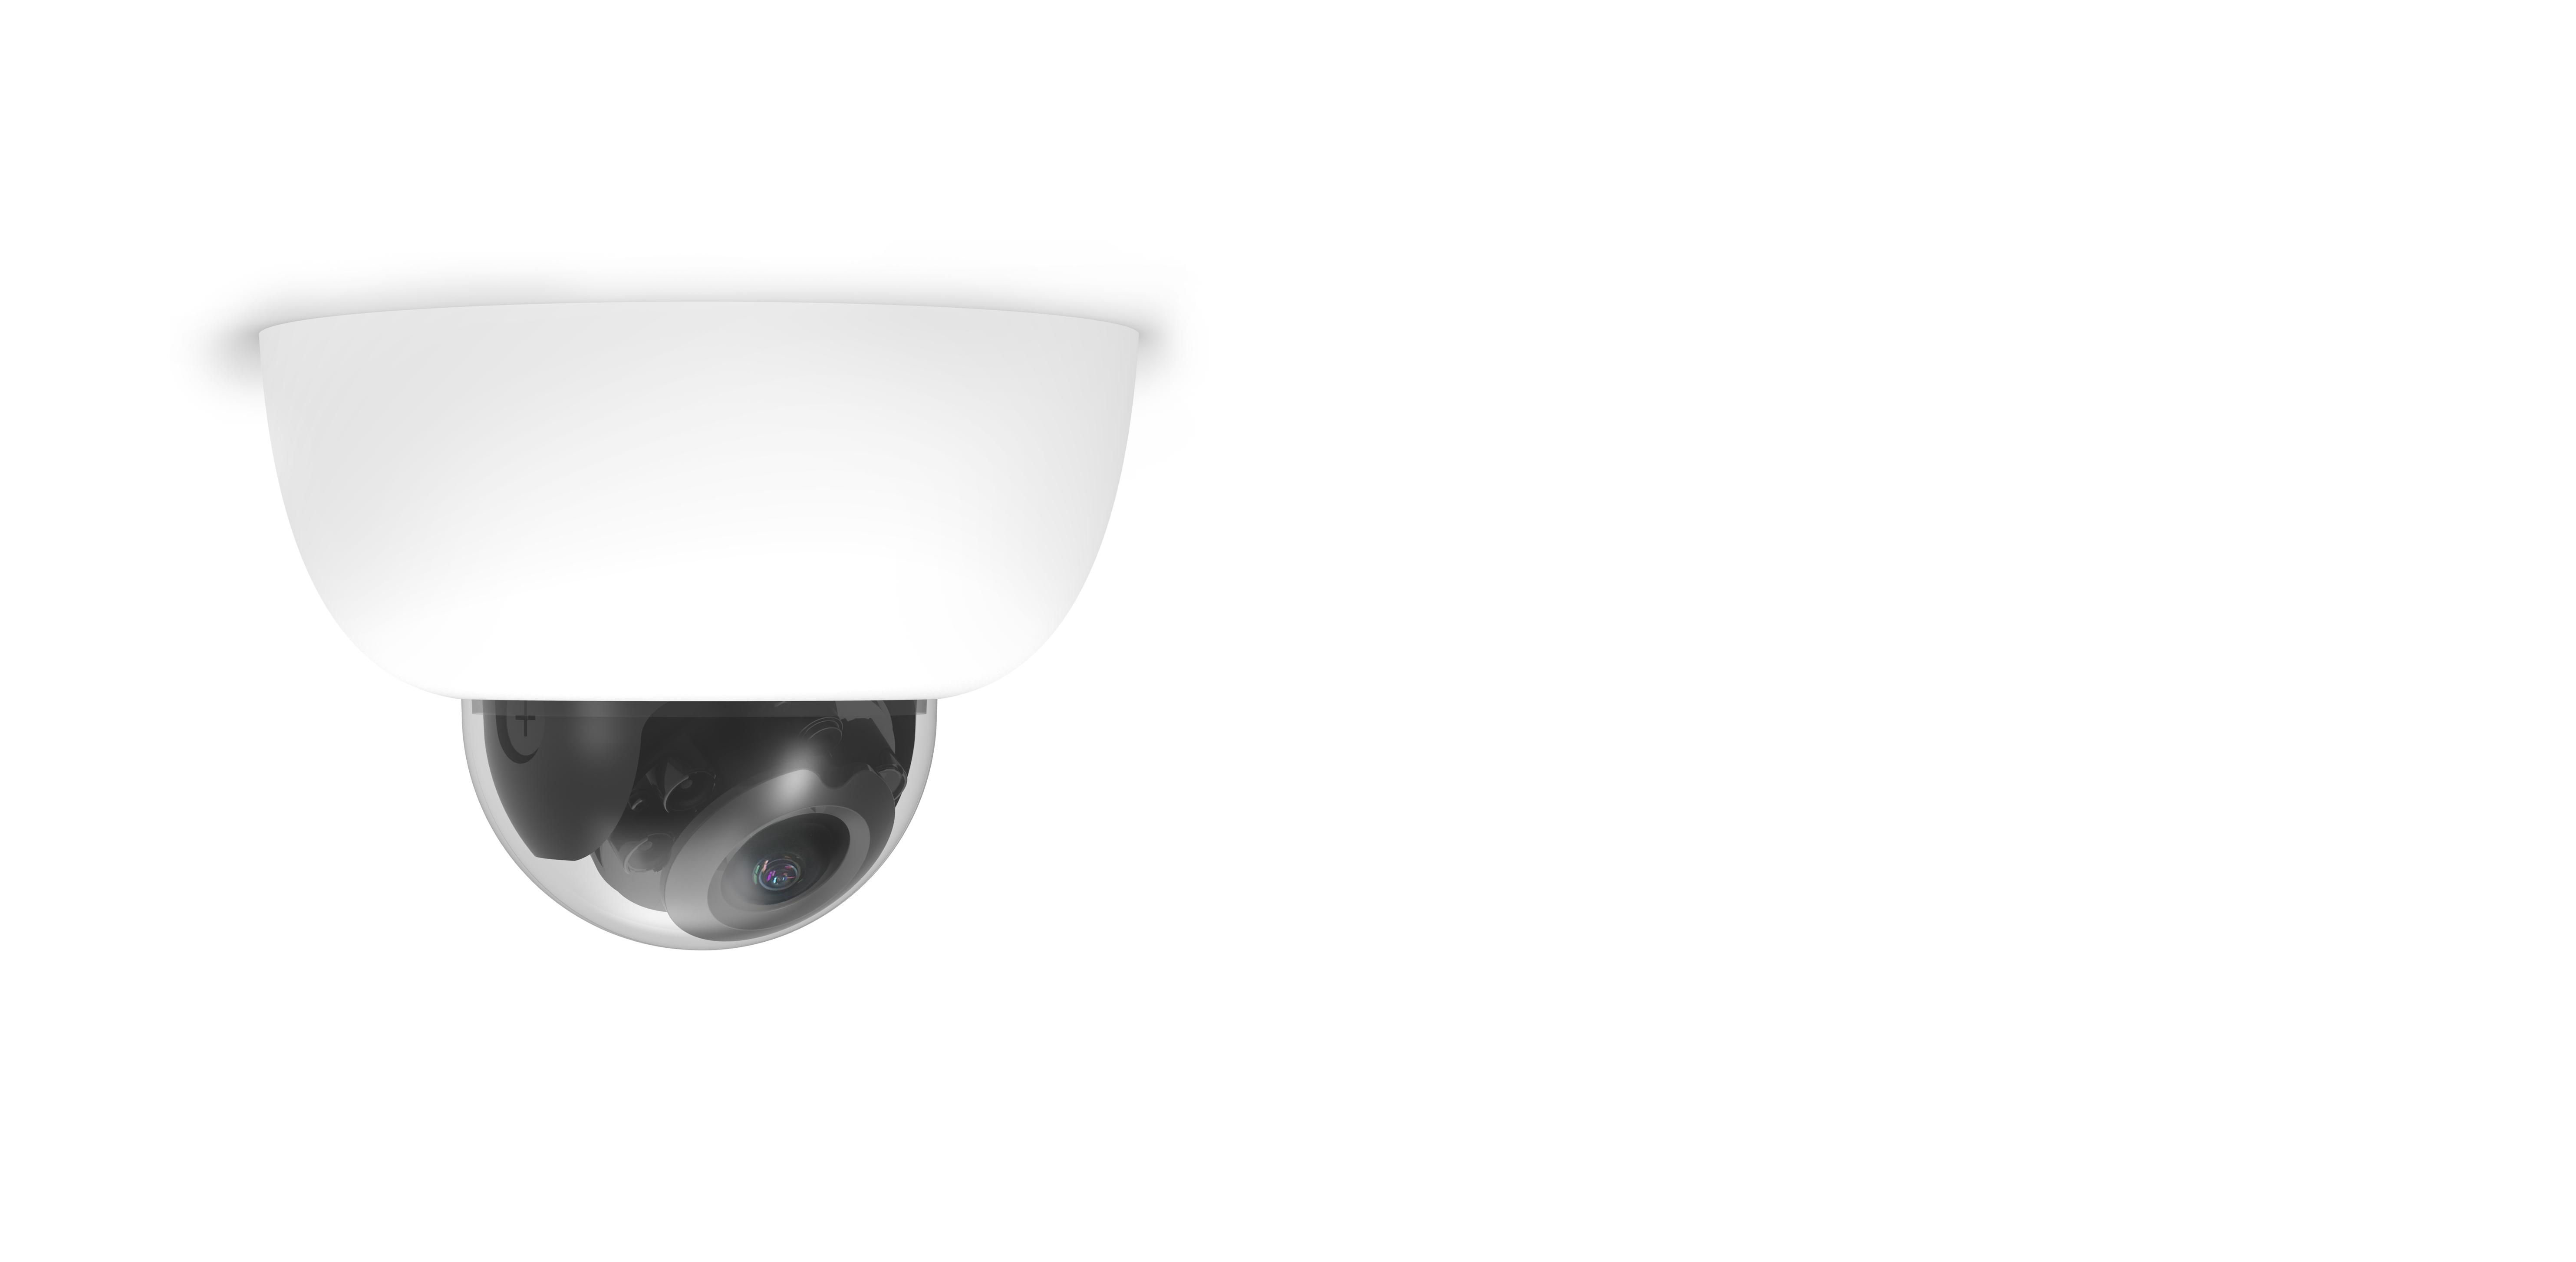 Meraki Security Cameras